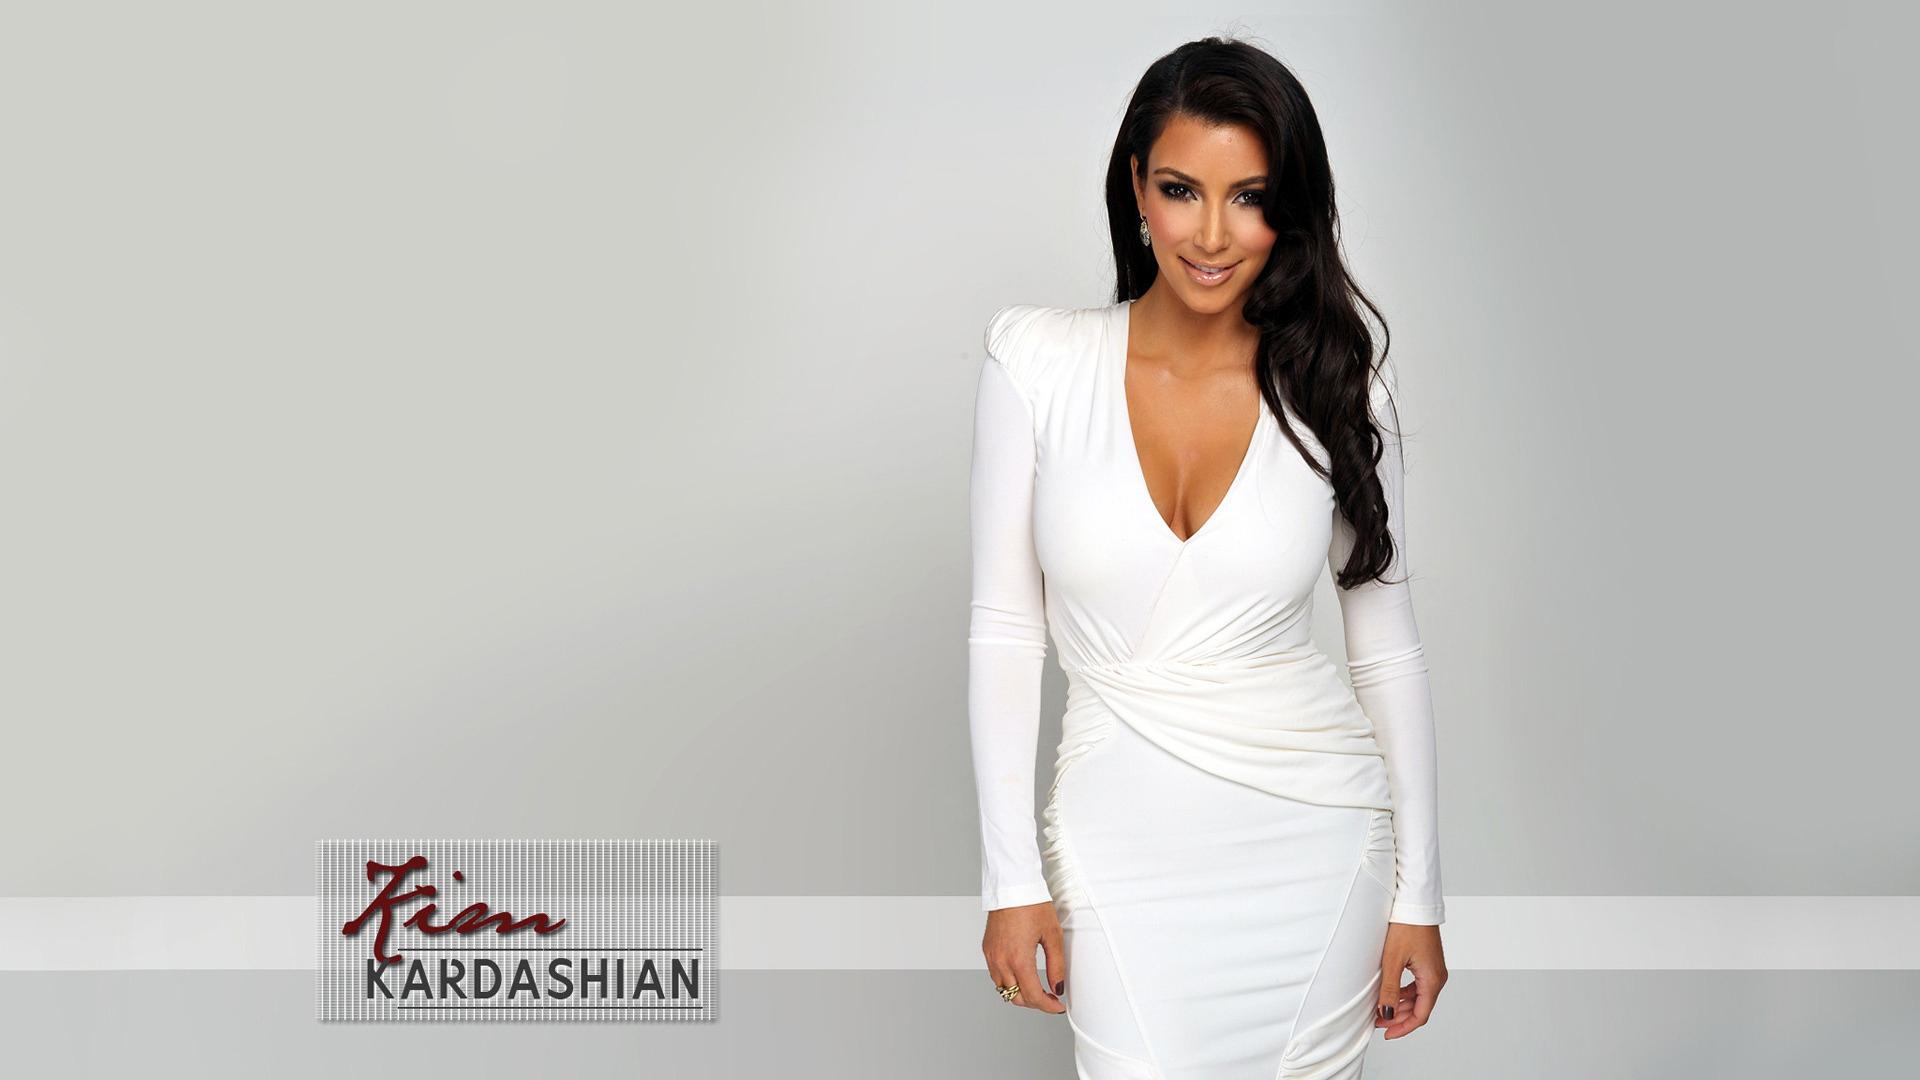 Free Download Kim Kardashian Wallpaper 1080p I Hd Images